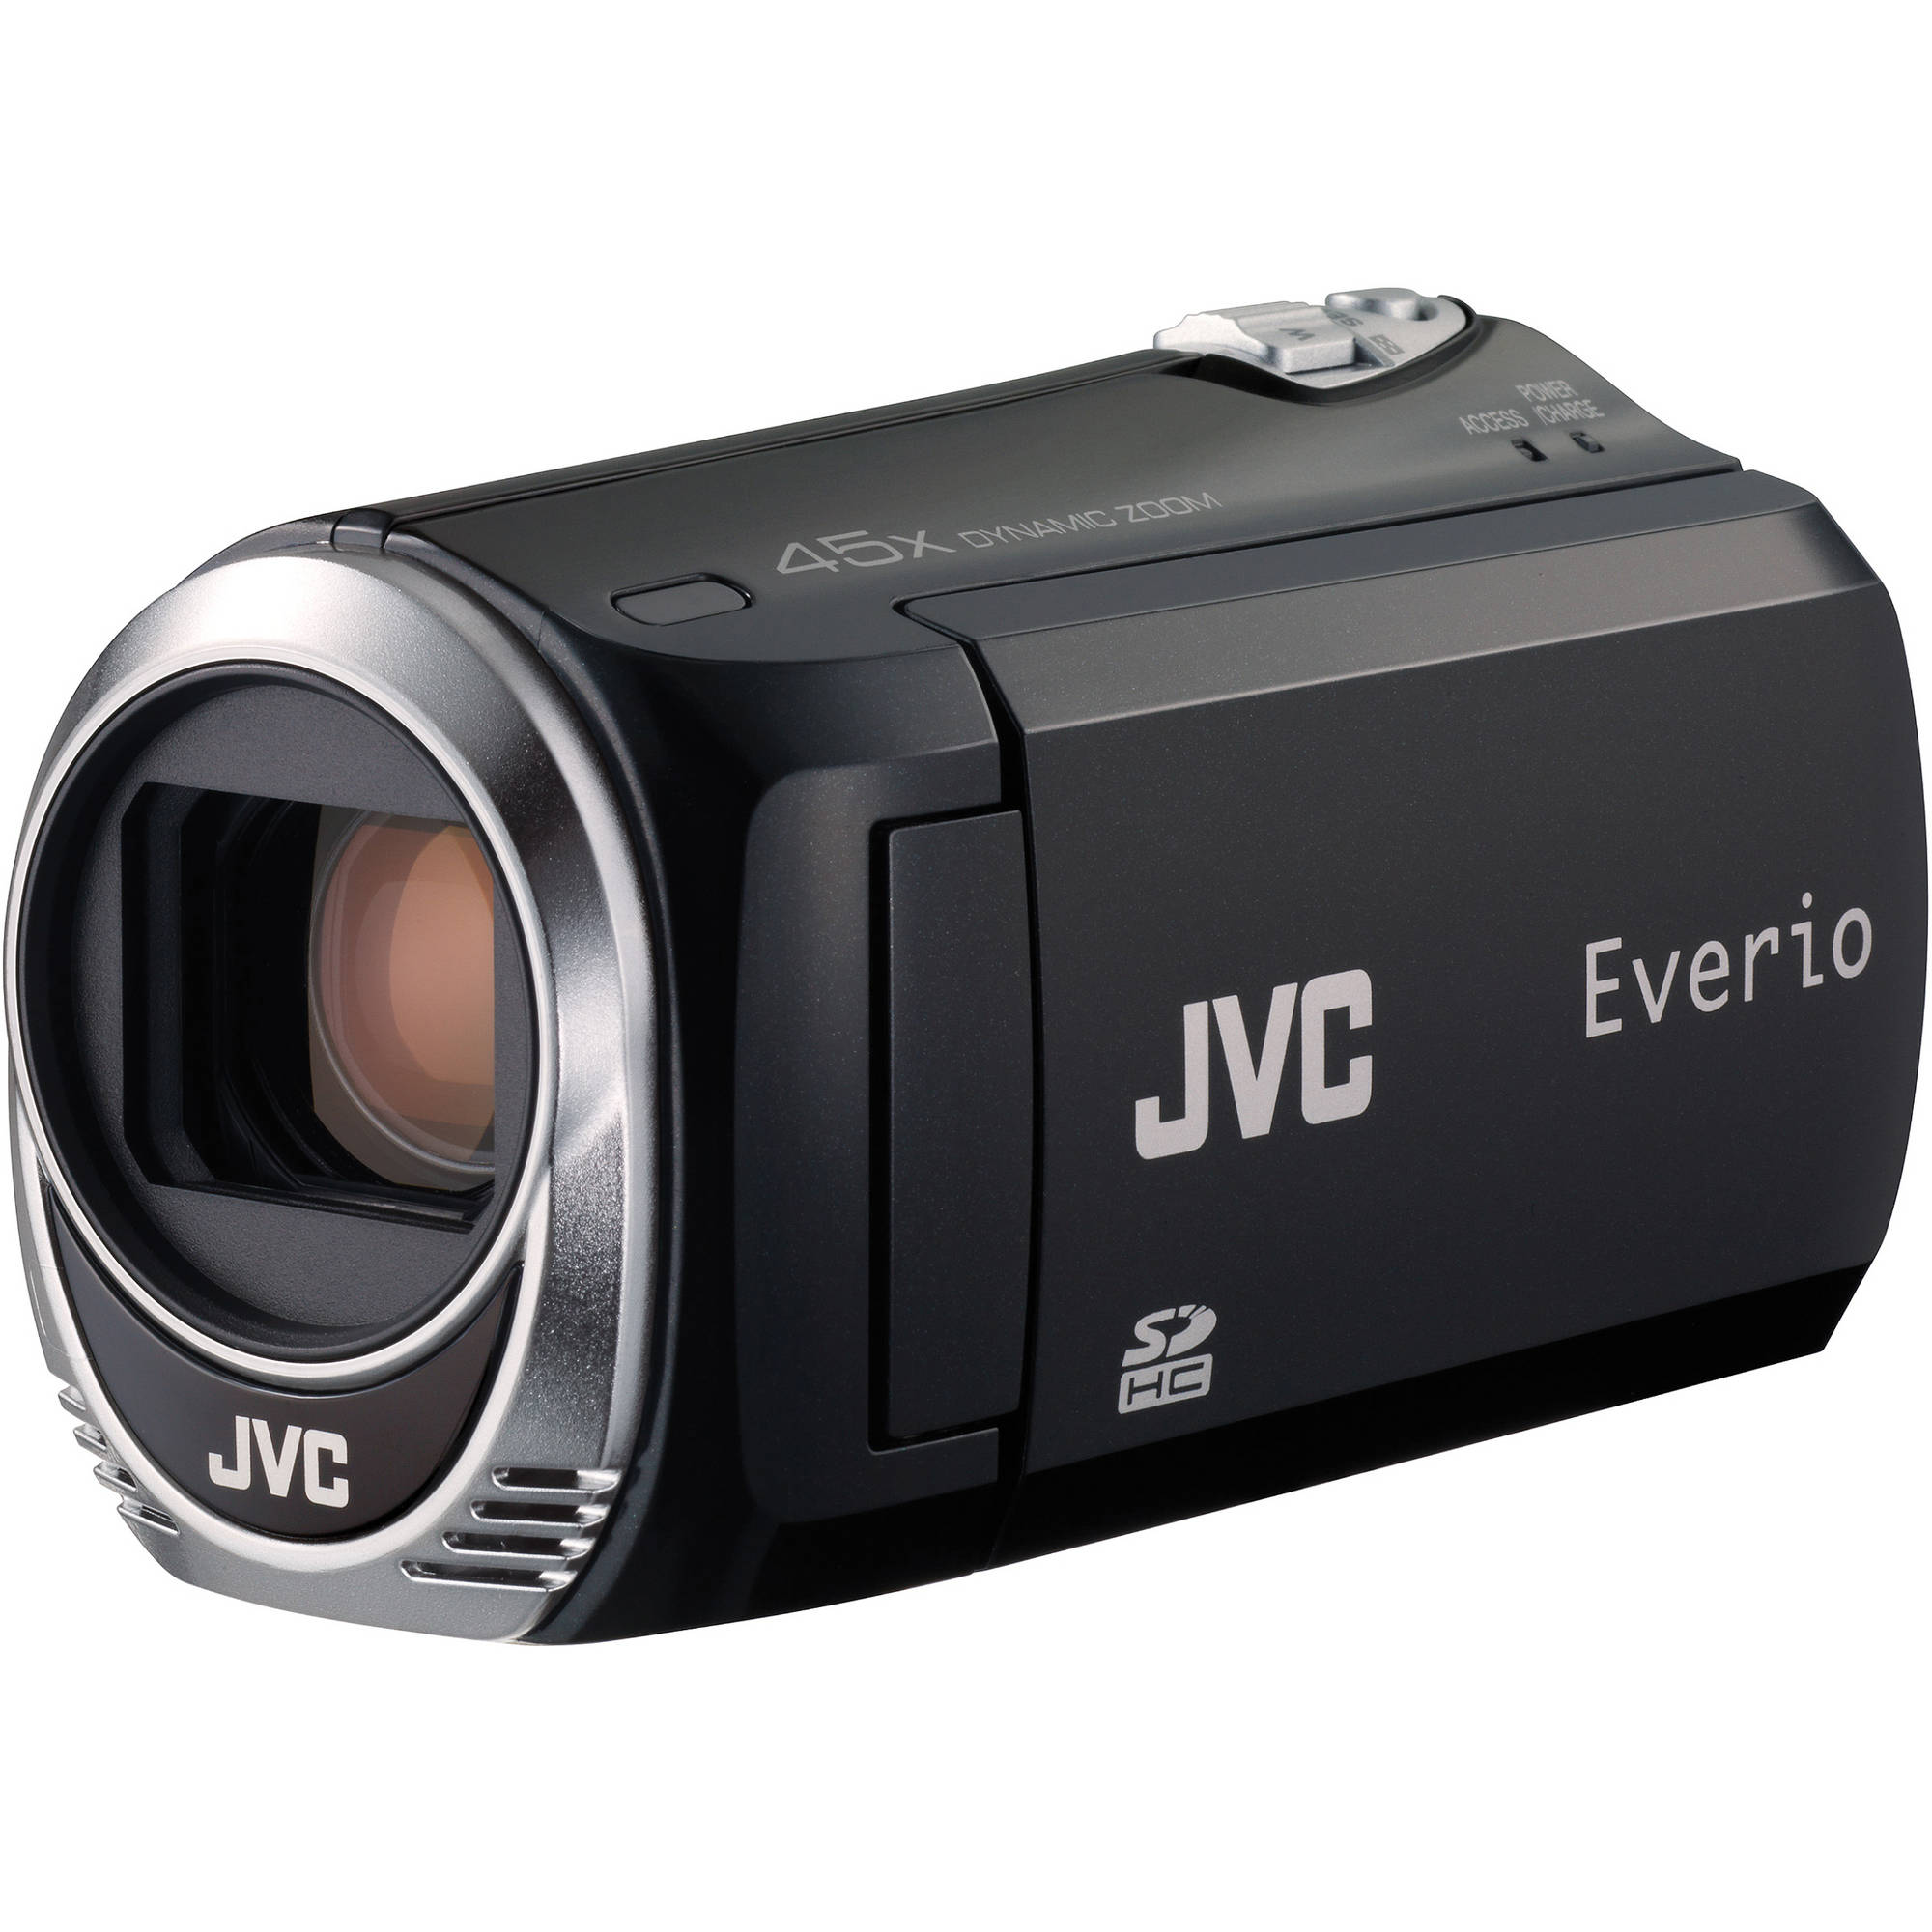 Free Card Reader 8GB SDHC High Speed Class 6 Memory Card for JVC Everio GZ-MS100 Digital Camcorder Secure Digital High Capacity 8 GB G GIG 8G 8GIG SD HC